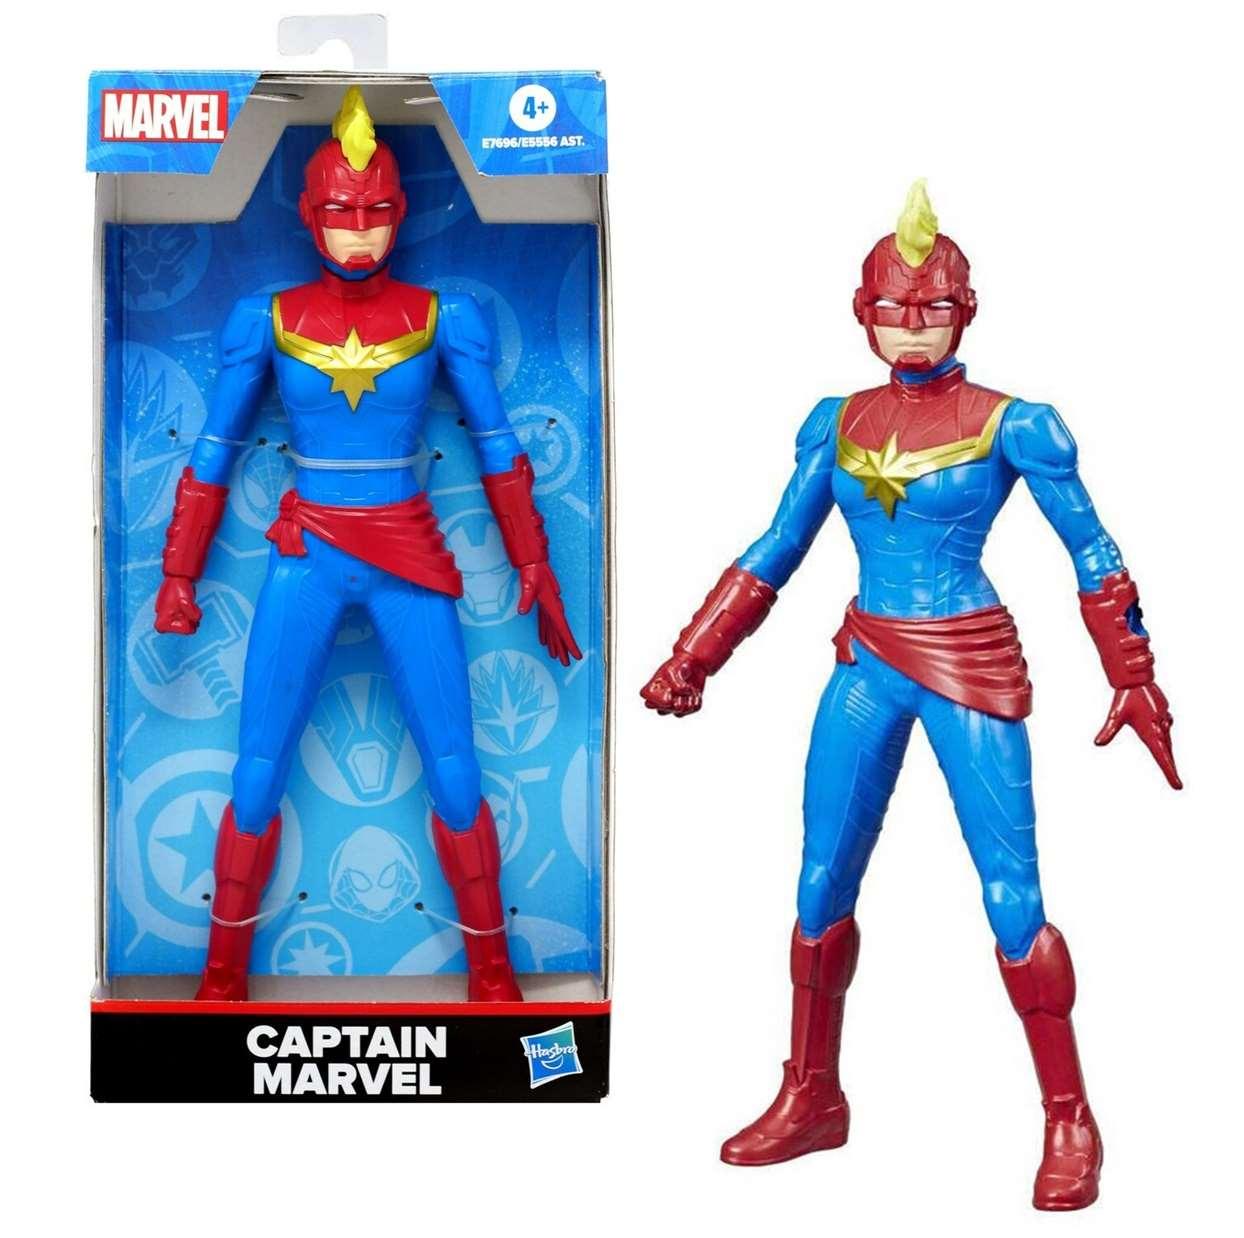 Captain Marvel Figura Marvel Hasbro E7696/ E5556 Ast 6 PuLG